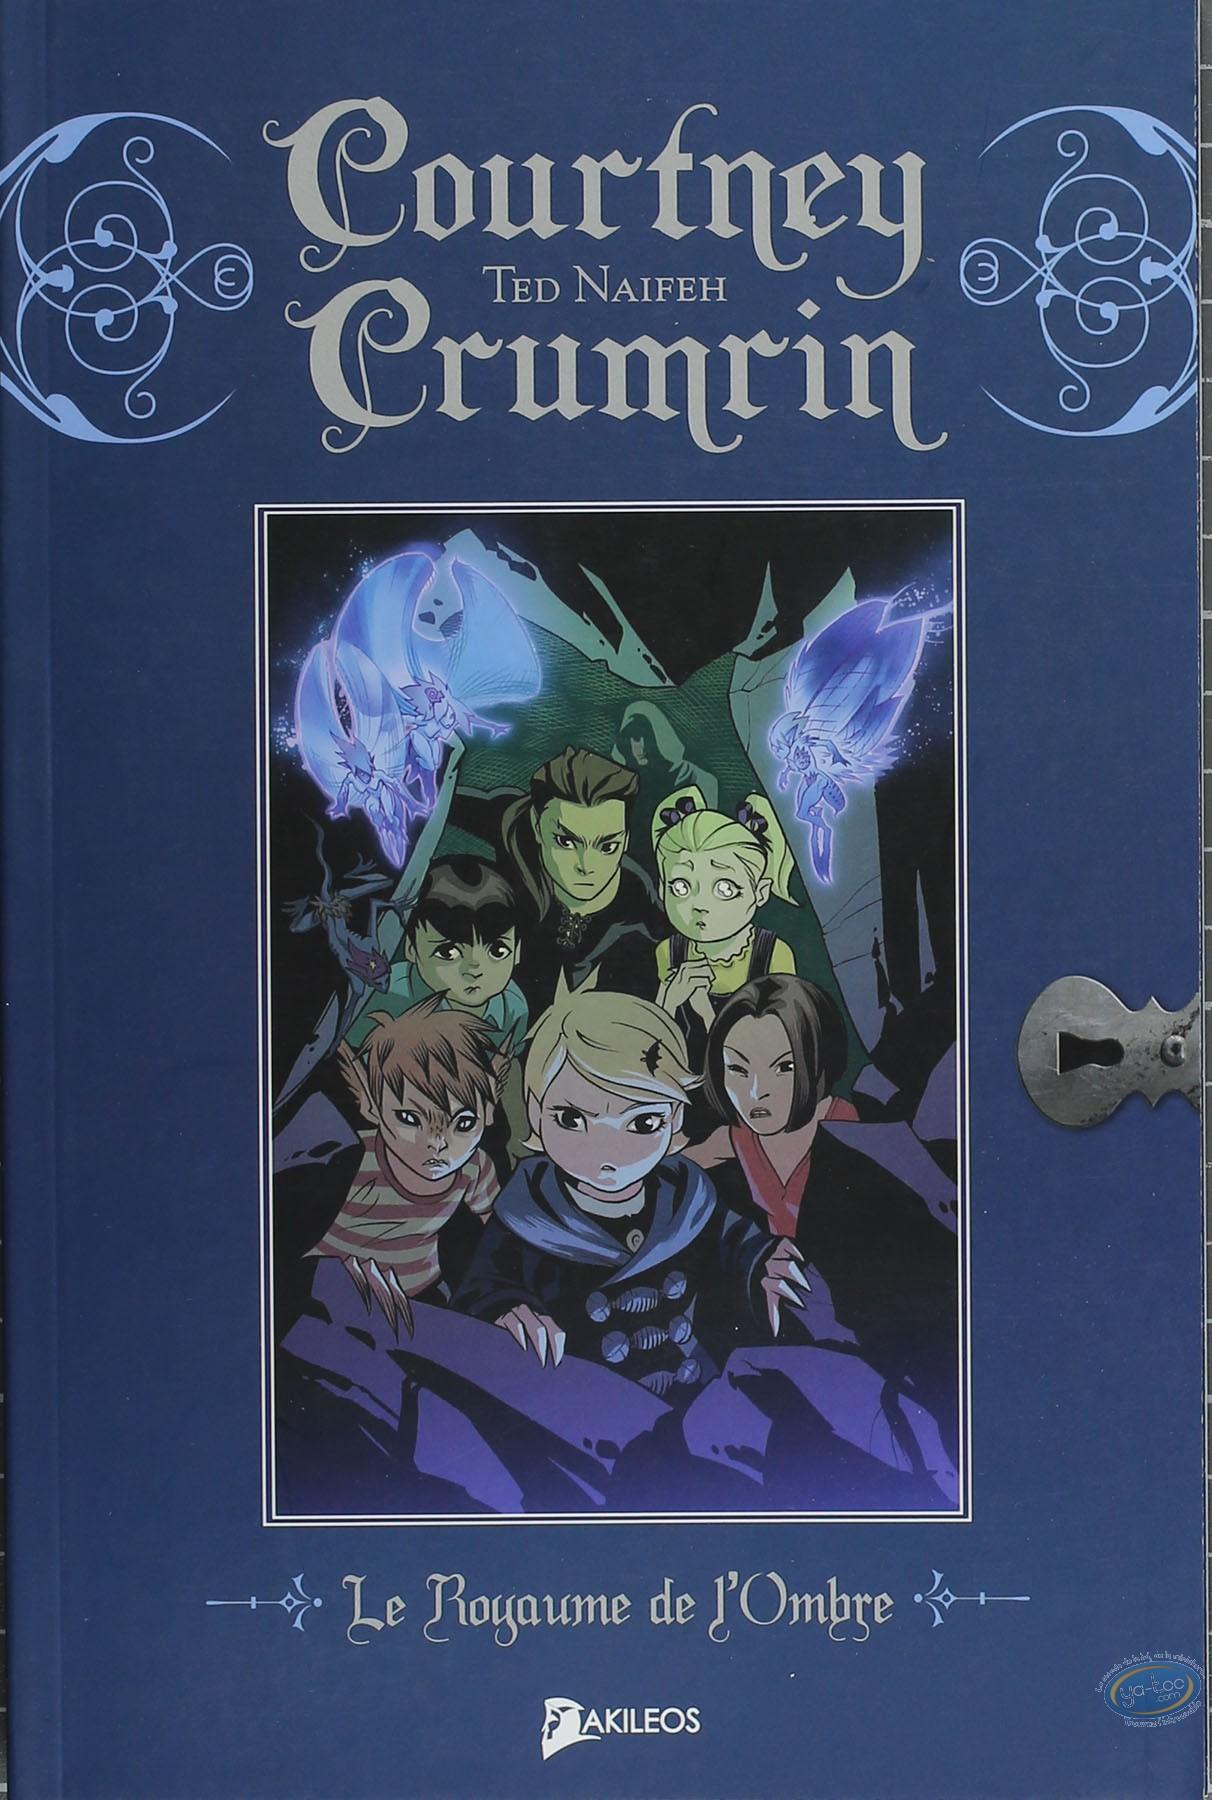 Reduced price European comic books, Courtney Crumrin : Le Royaume de l'Ombre